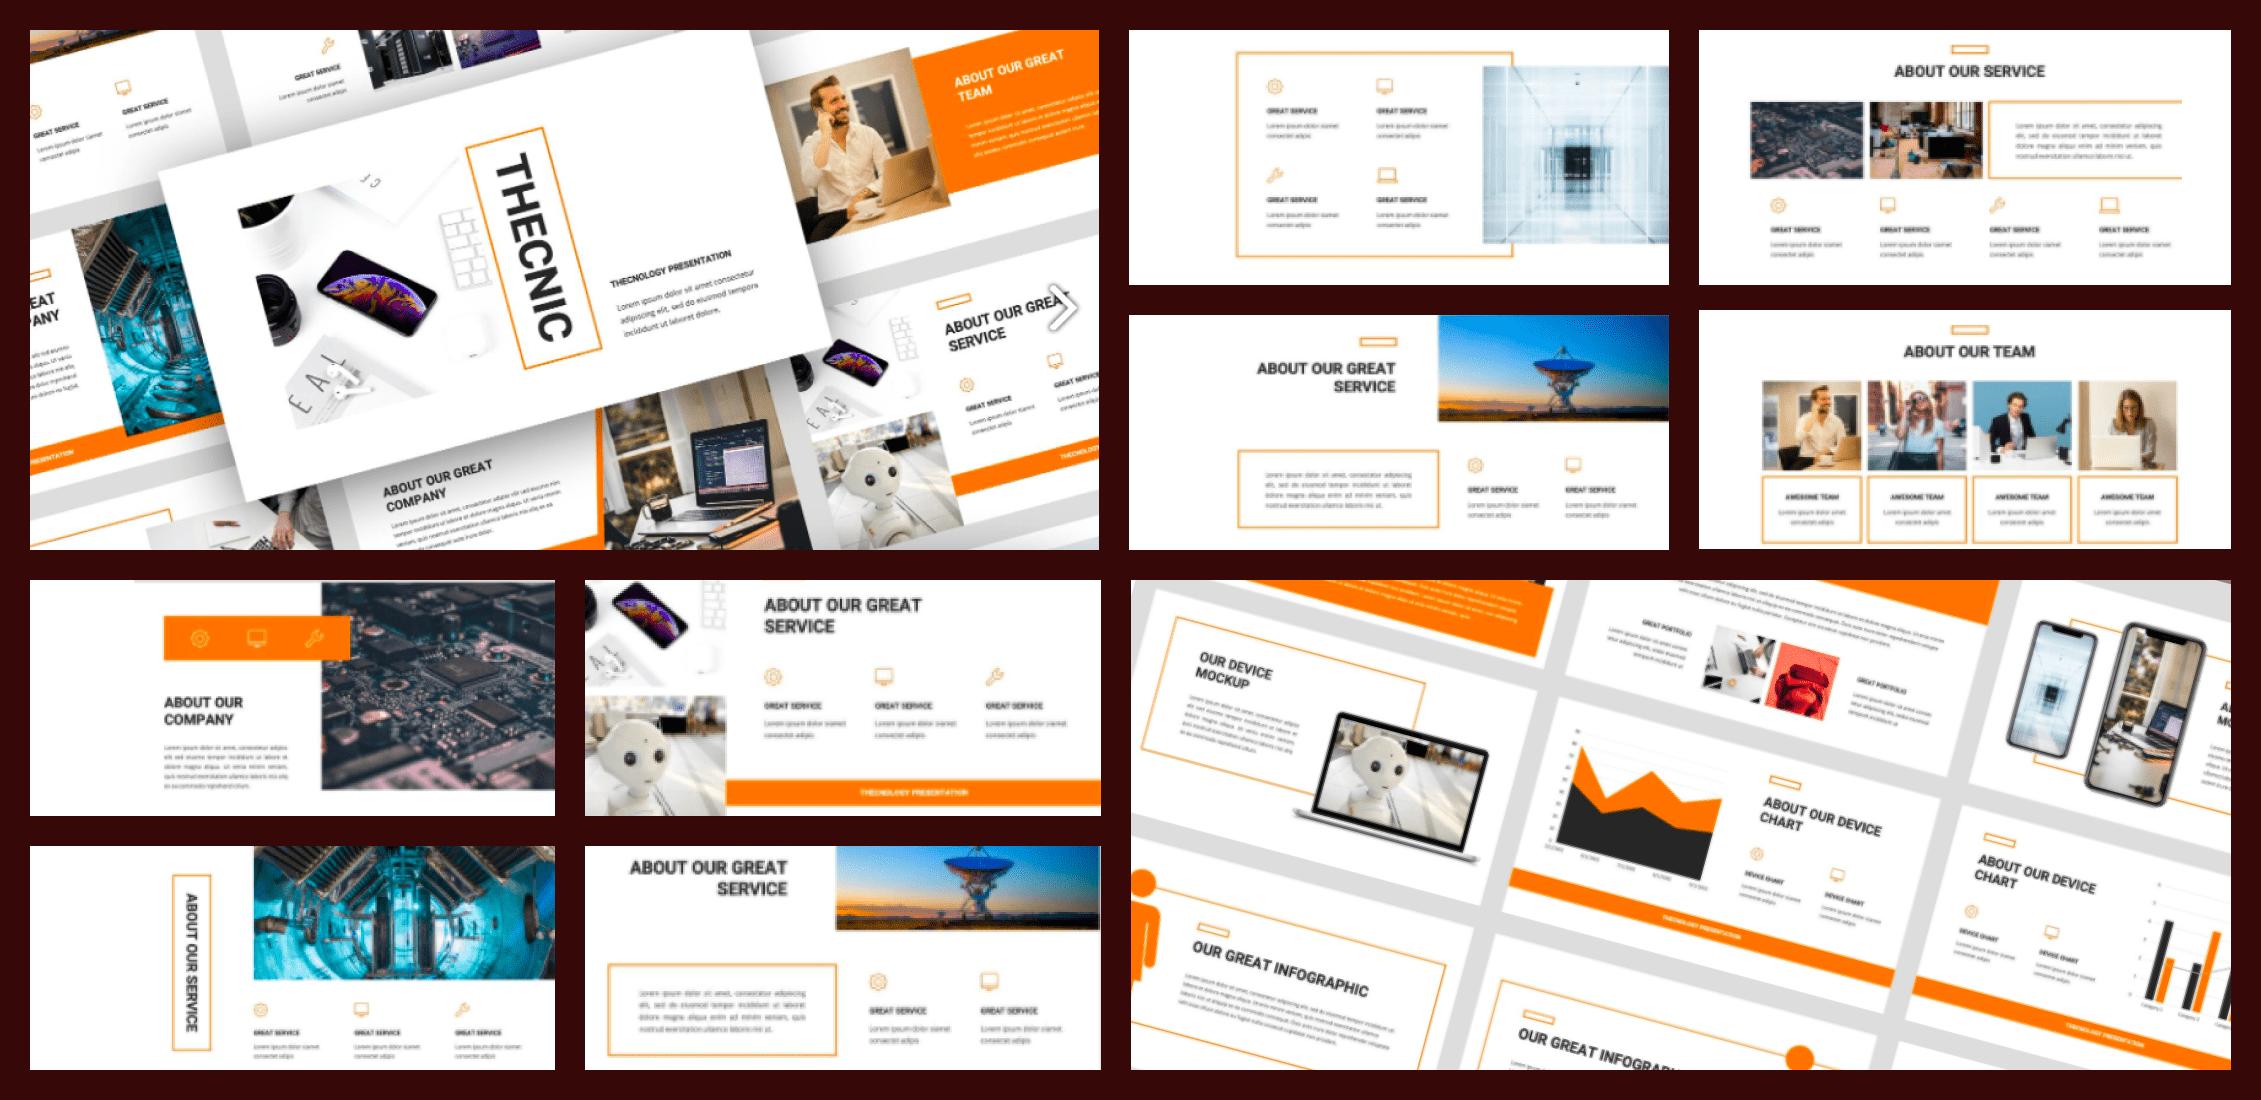 50+ Free and Premium Simple Google Slides Themes in 2021 - simple google slides theme 29